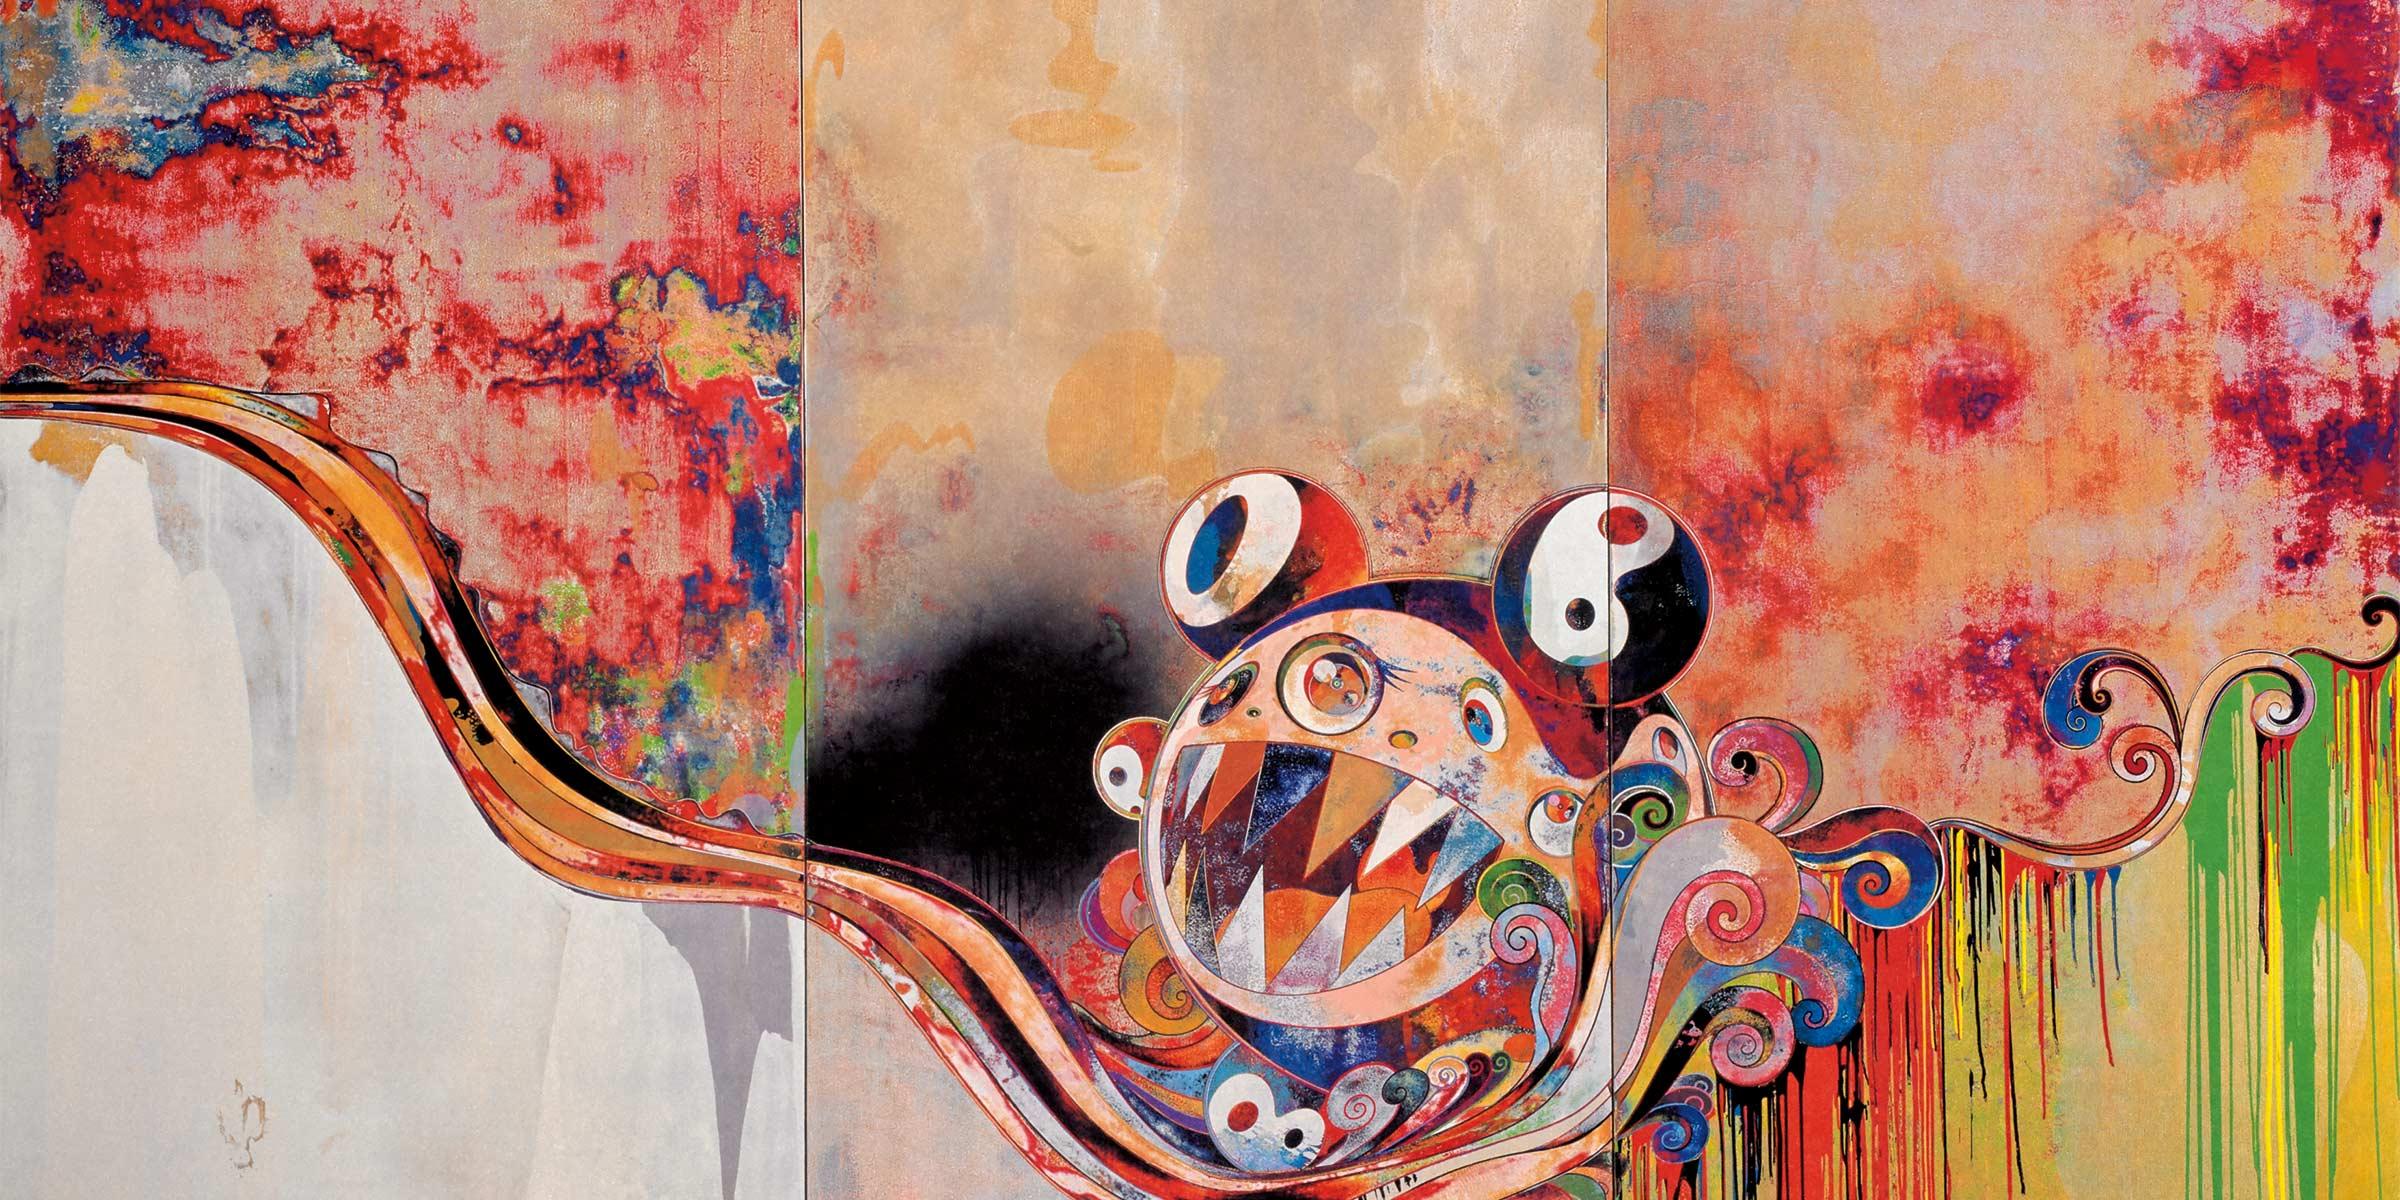 Takashi Murakami, 727-272, 2007.  http://martinlawrence.com/takashi-murakami/